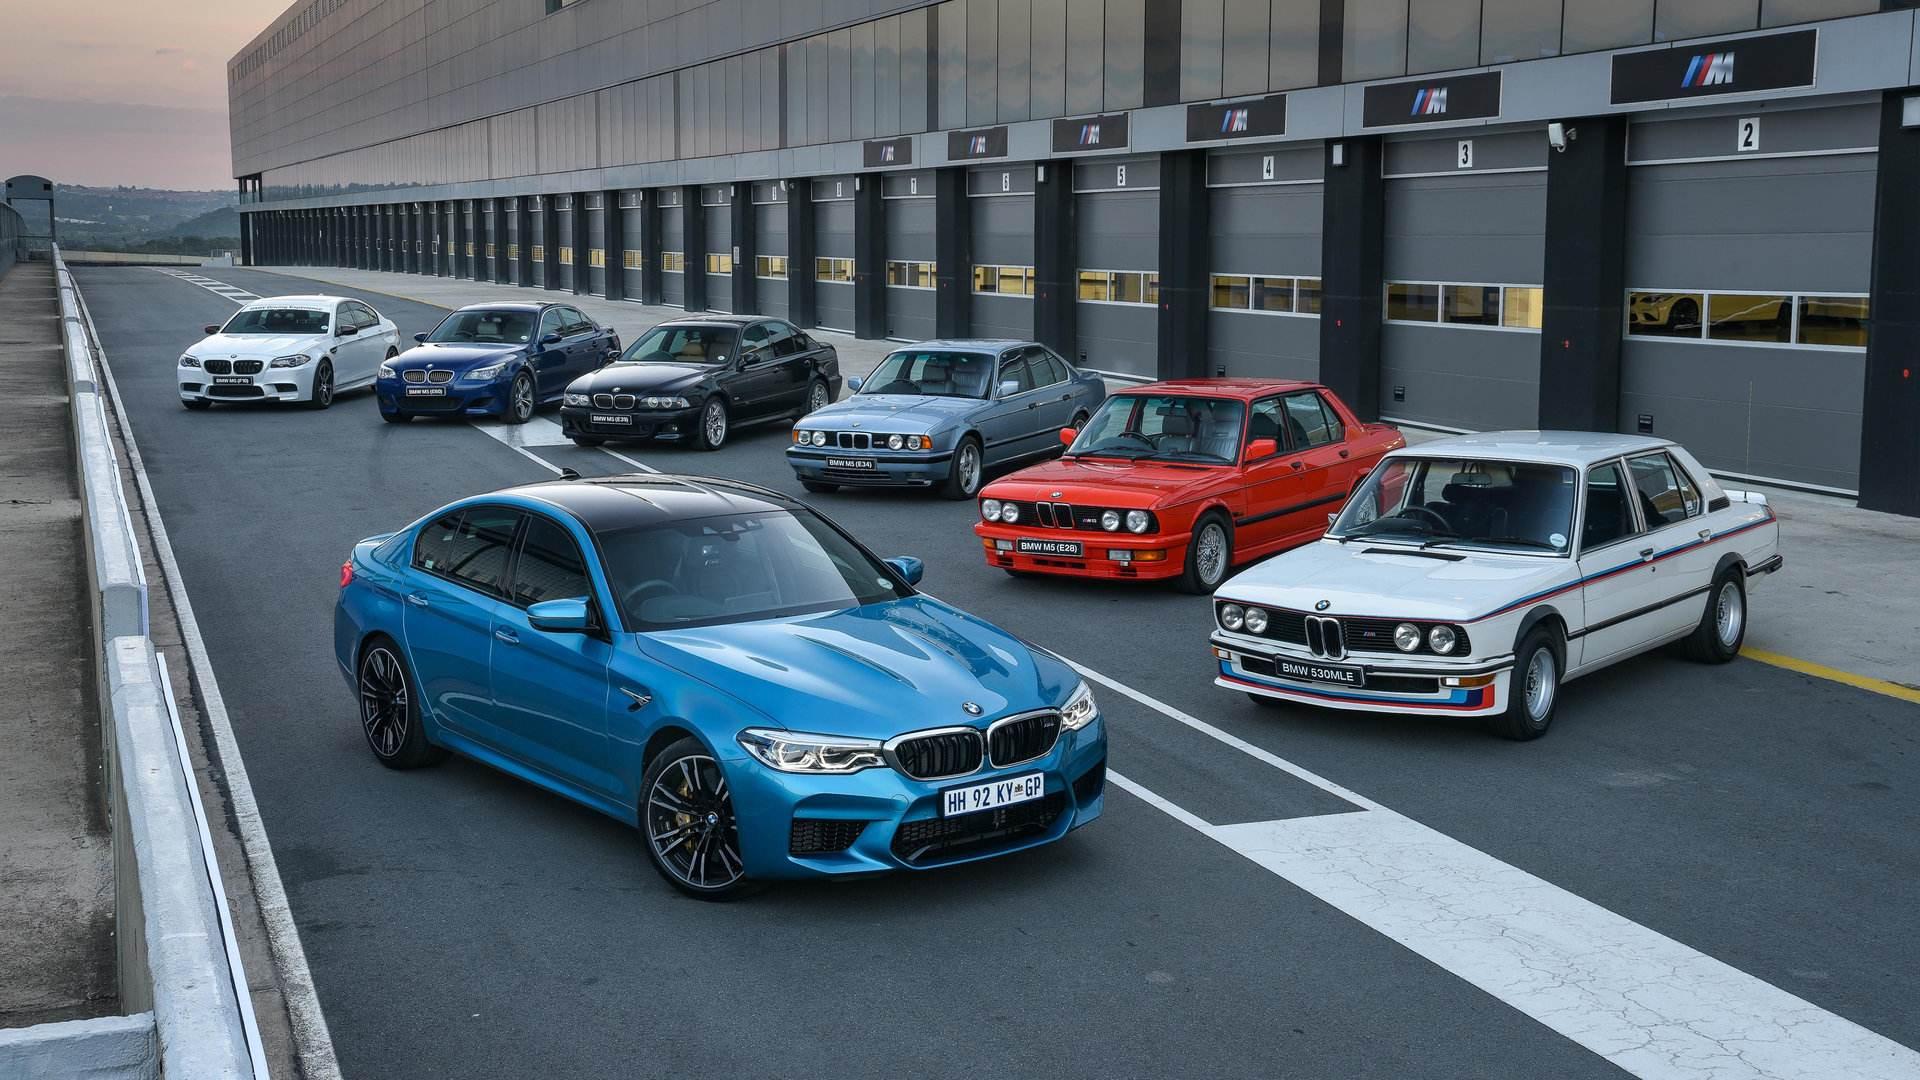 BMW M5 Evolucion